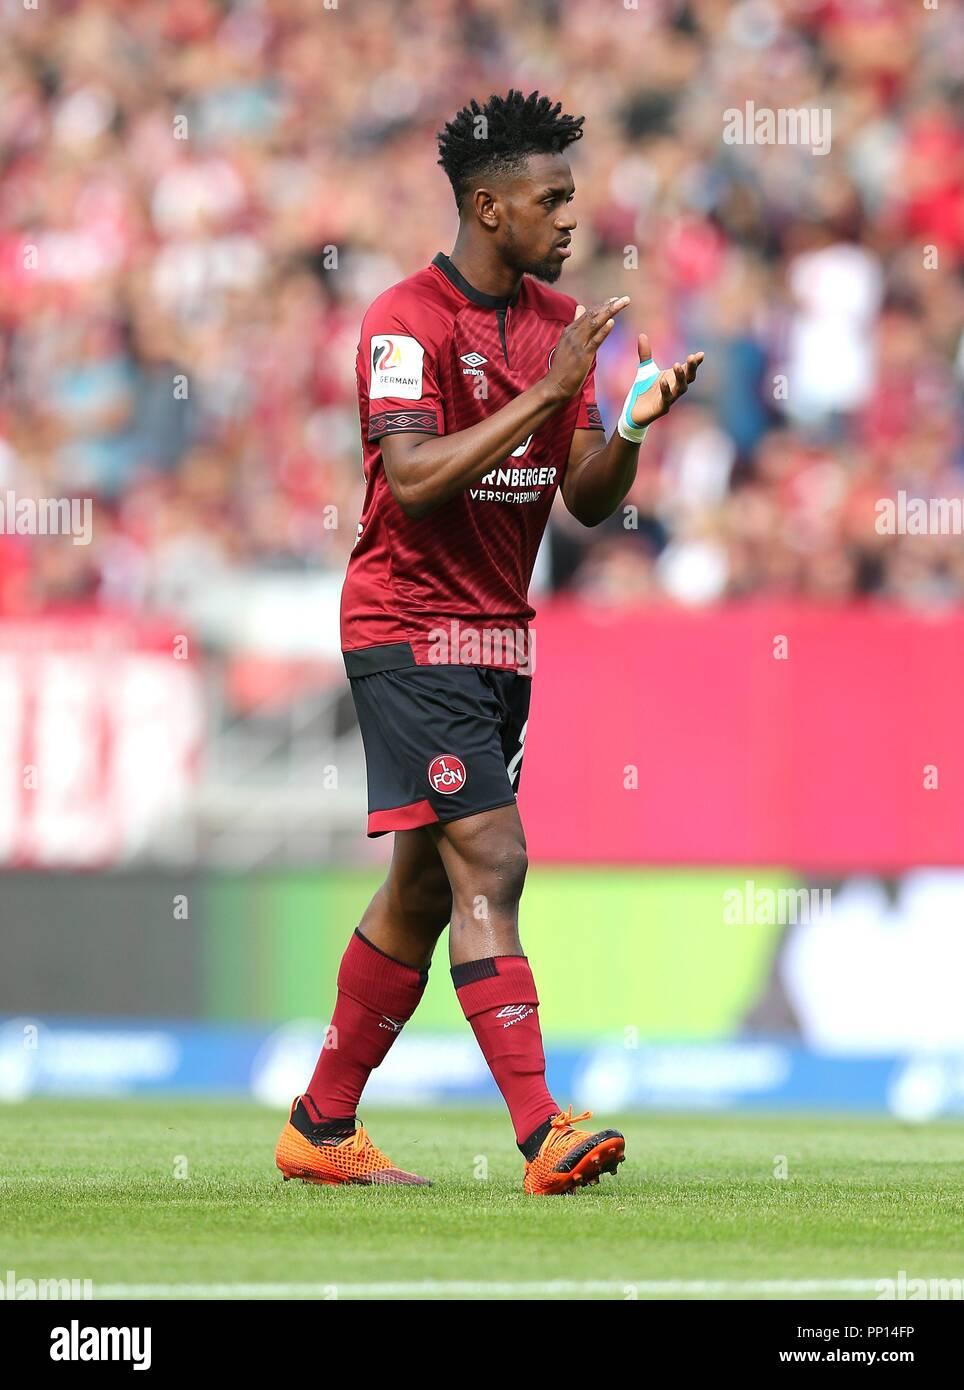 firo: 22.09.2018 Fuvuball, Football: 1.Bundesliga 1.FC Nvºrnberg - Hanover 96, Virgil Misidjan, Nvºrnberg, full figure, gesture | usage worldwide Stock Photo